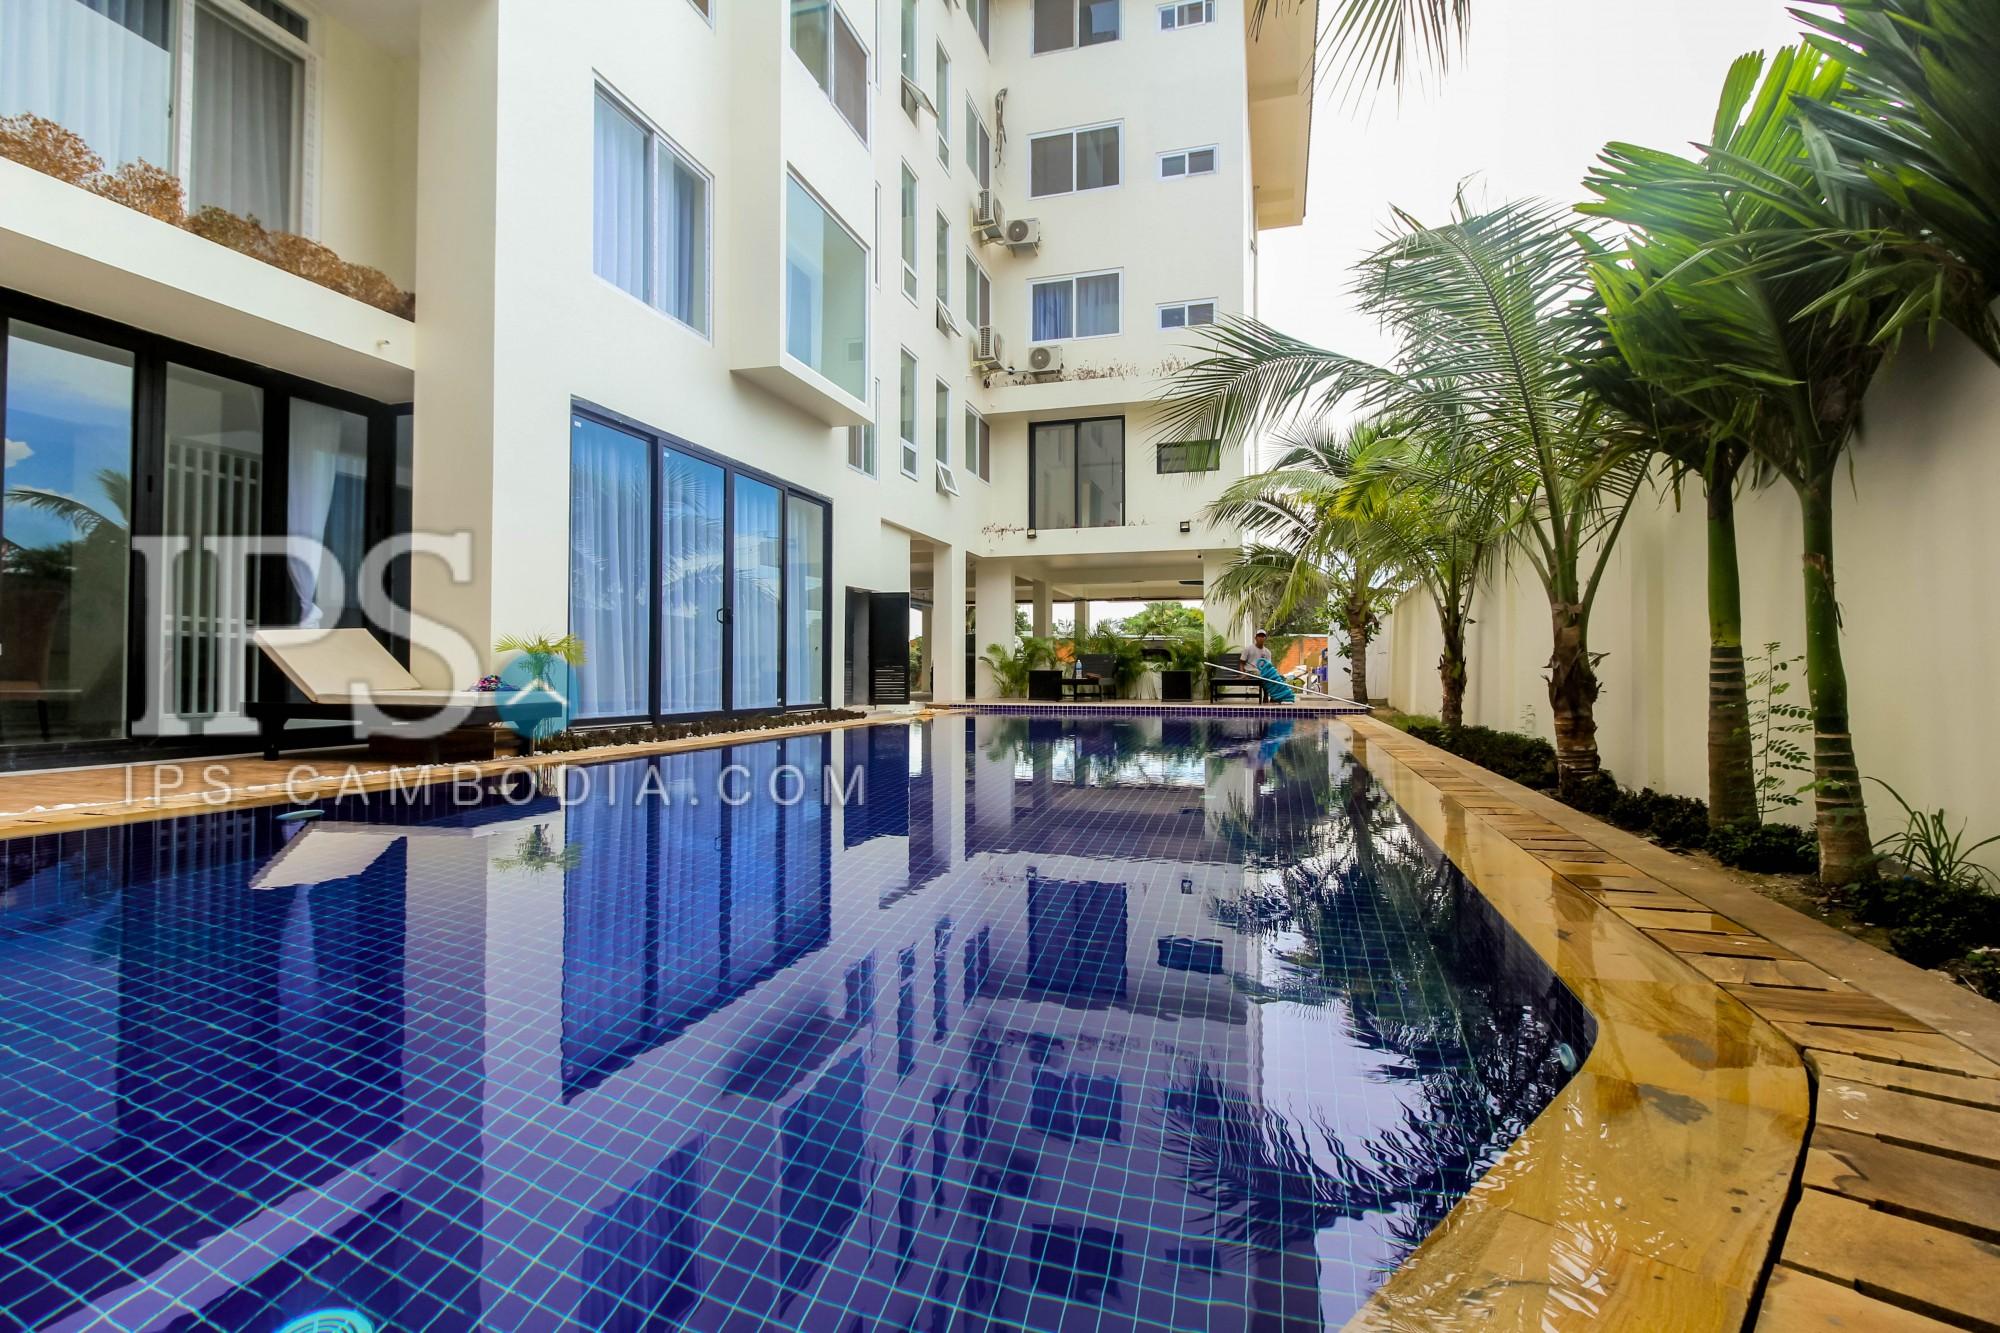 3 Bedroom Condo For Sale in Svay Dangkum, Siem Reap